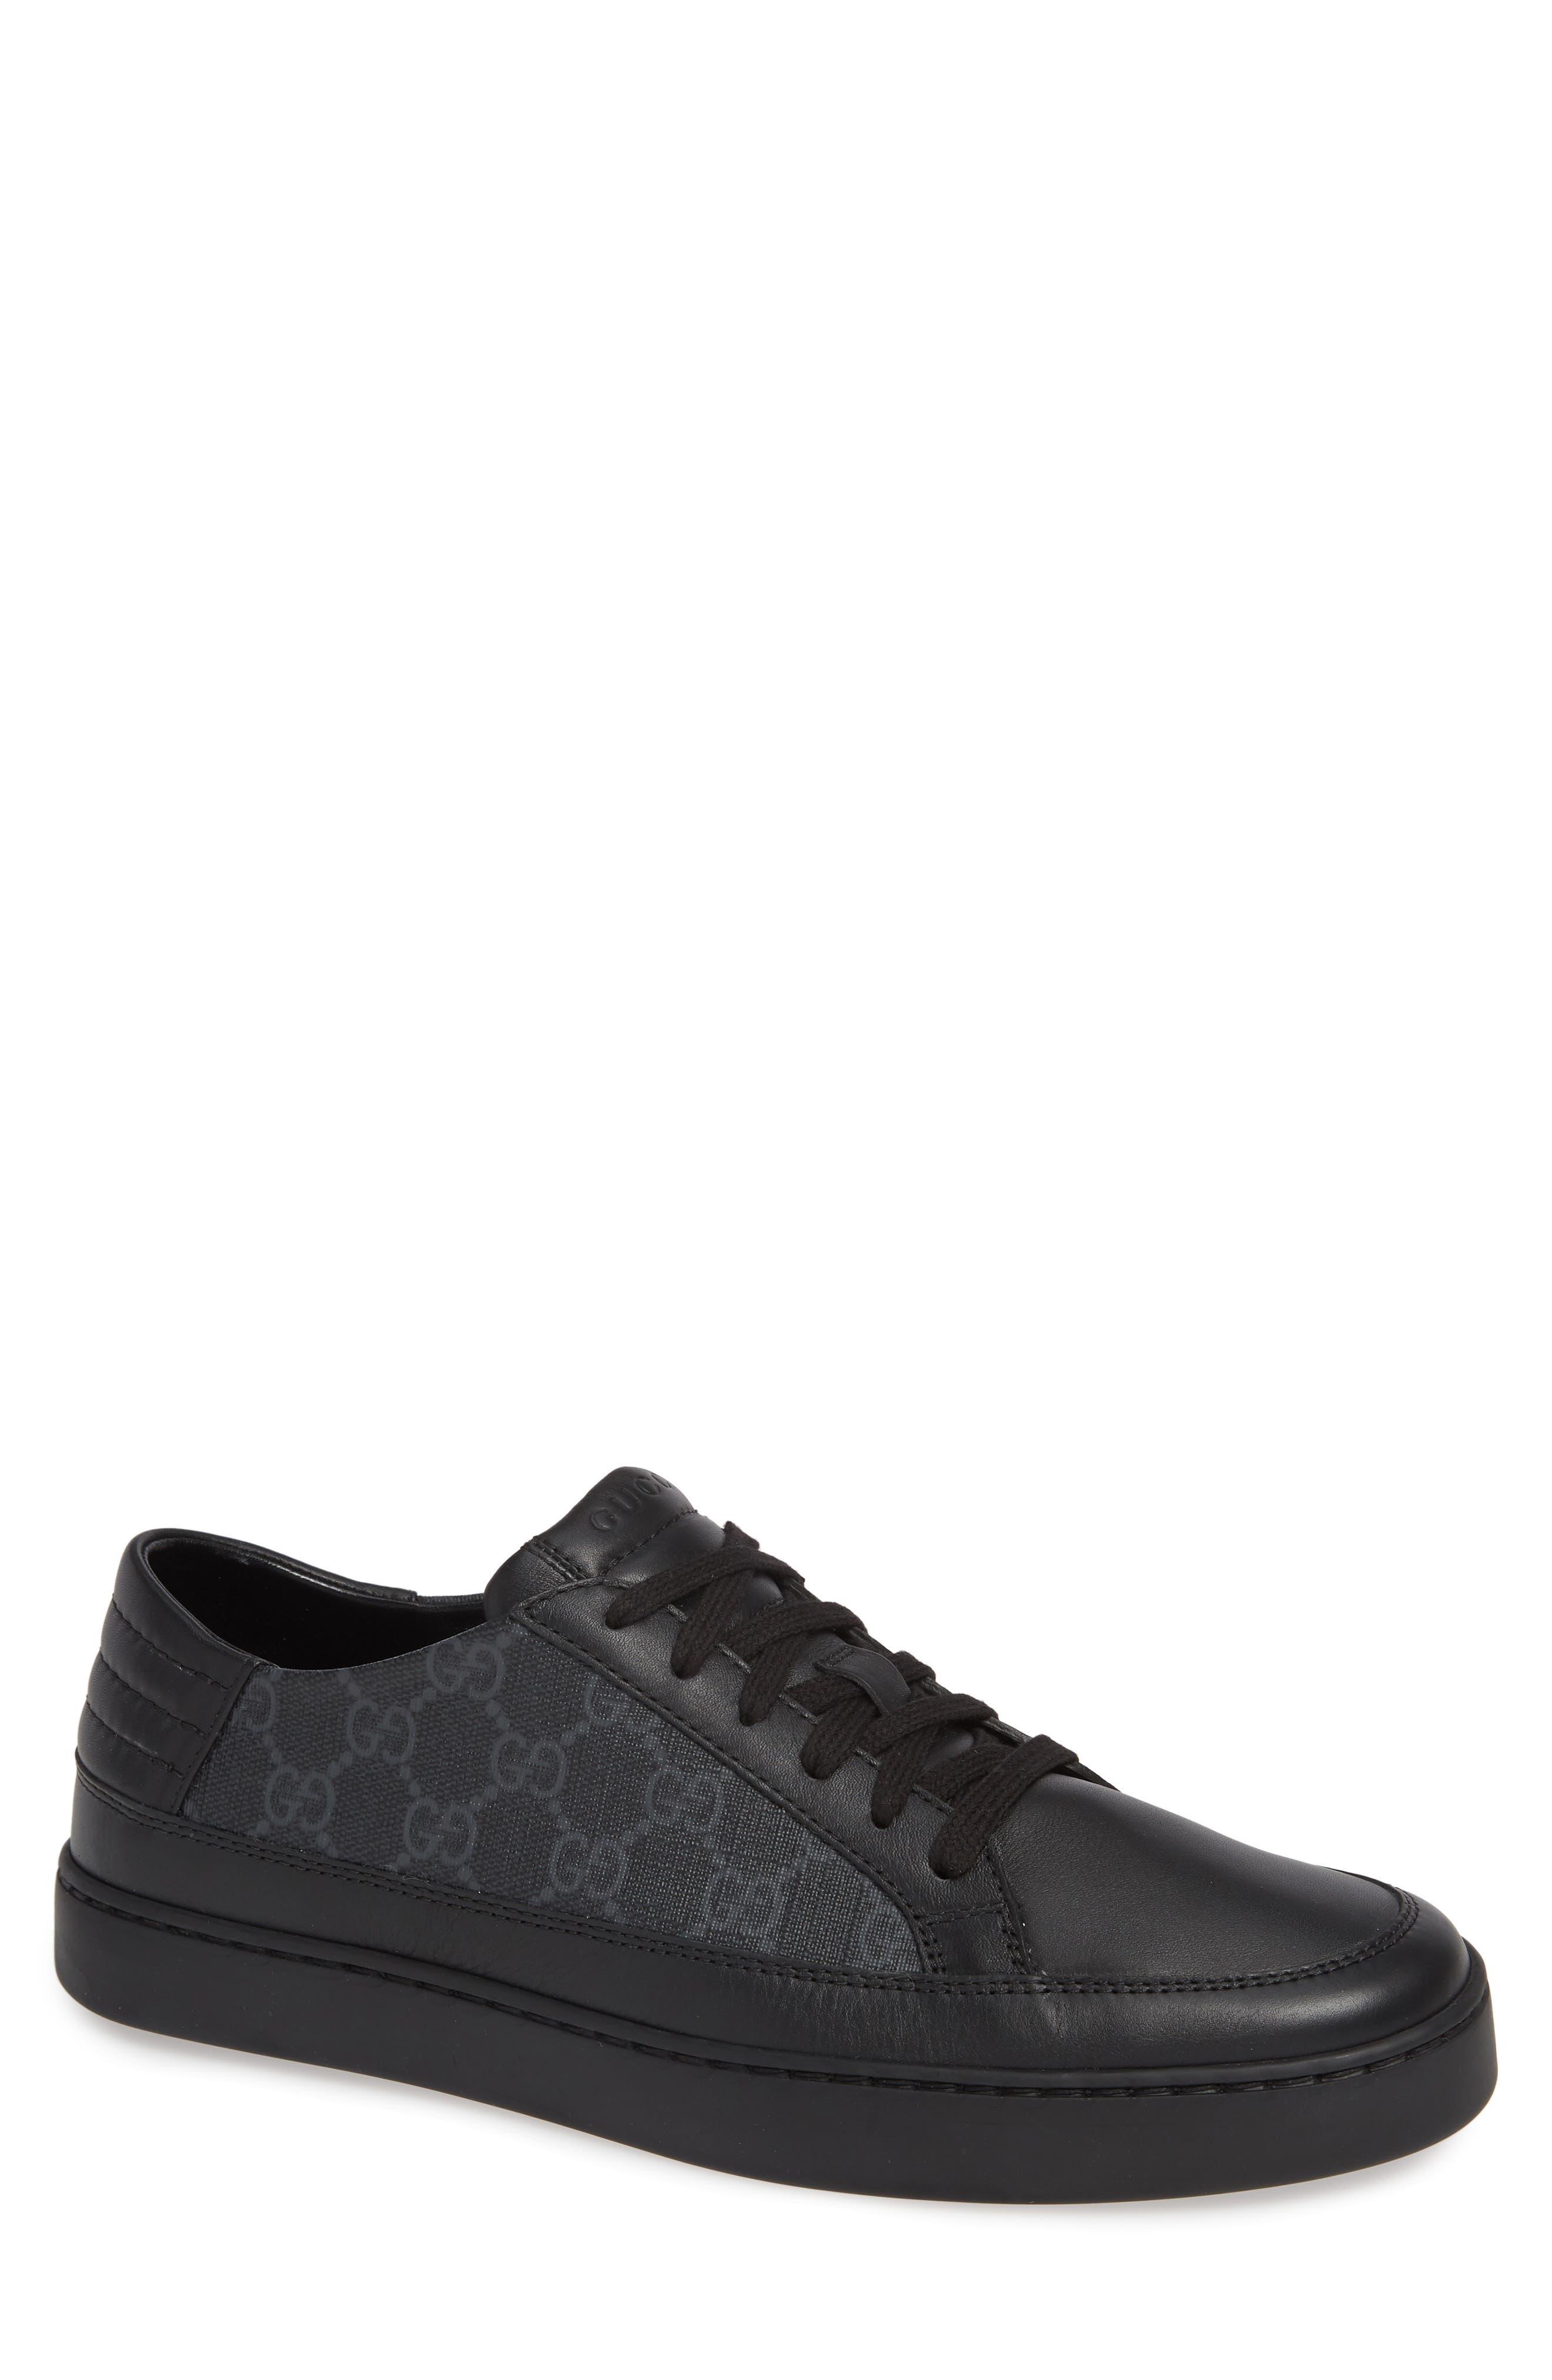 'Common' Low-Top Sneaker,                             Main thumbnail 1, color,                             NERO/ BLACK